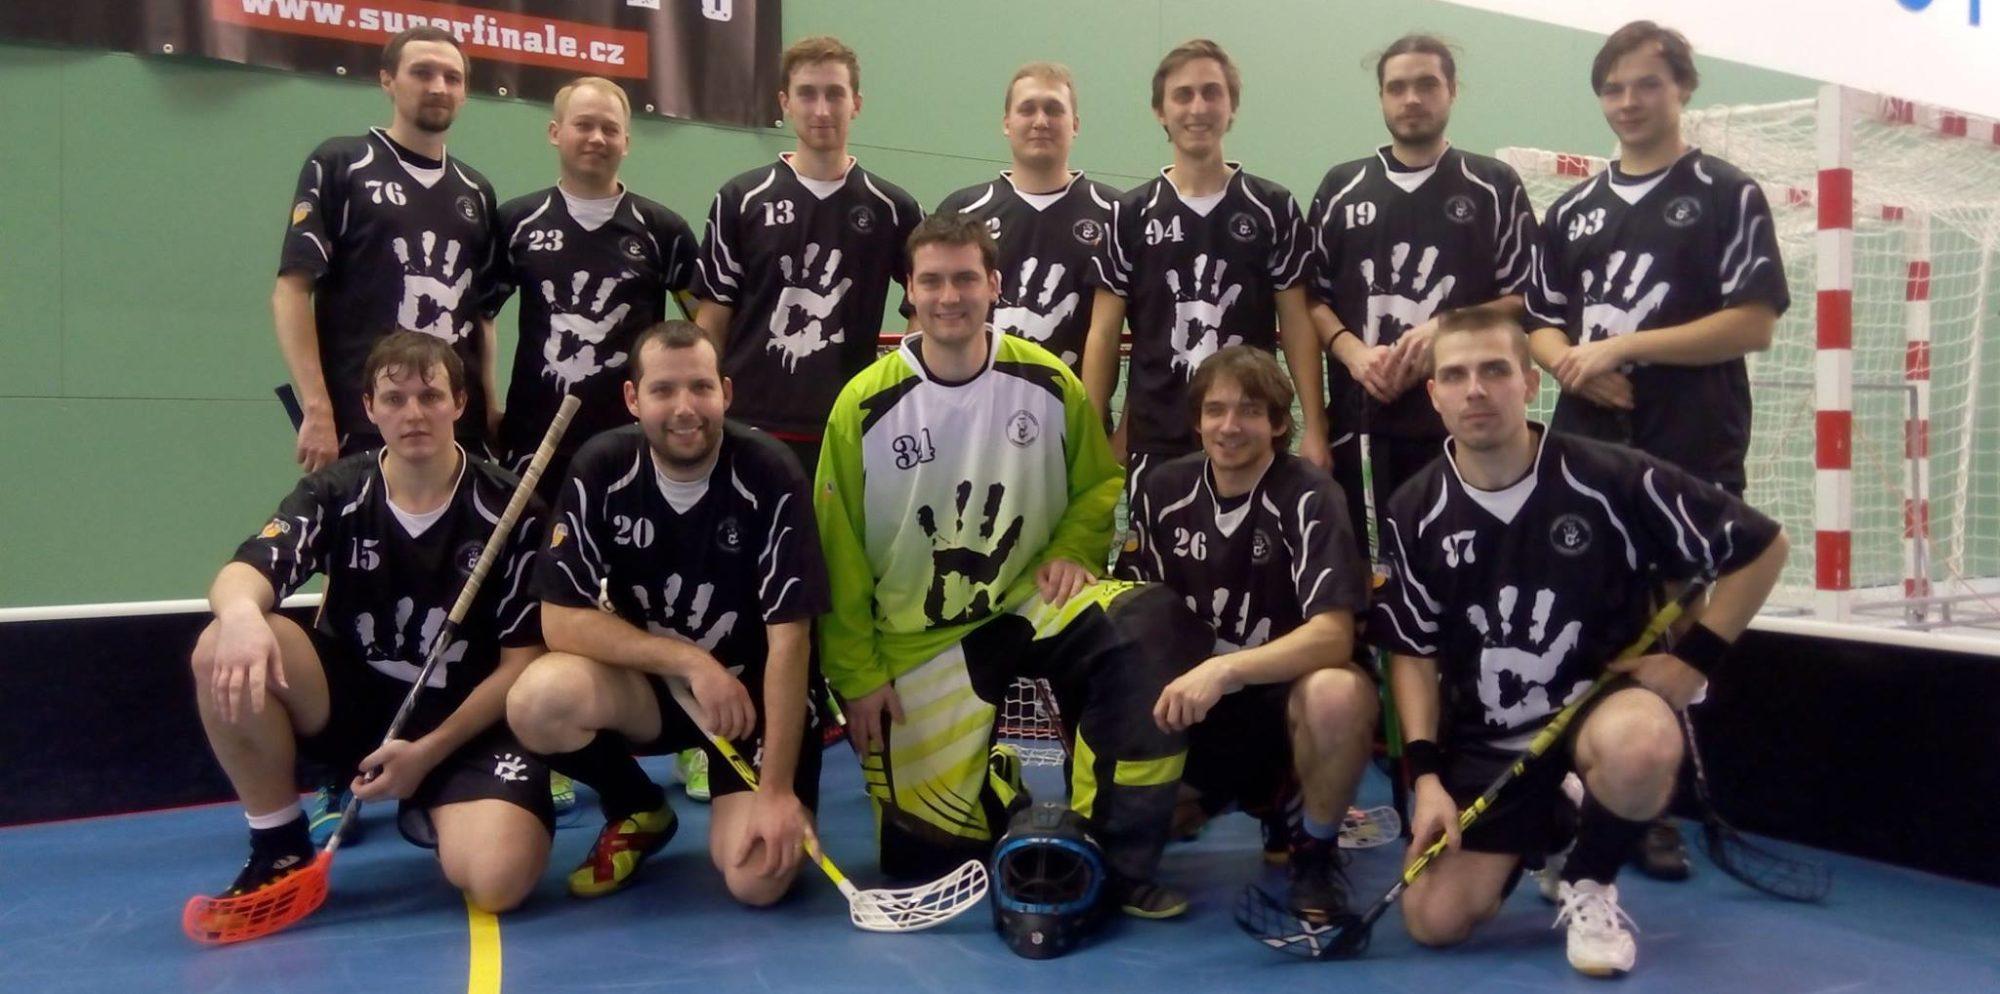 VSK VUT Skurut Hai Brno - florbalový tým